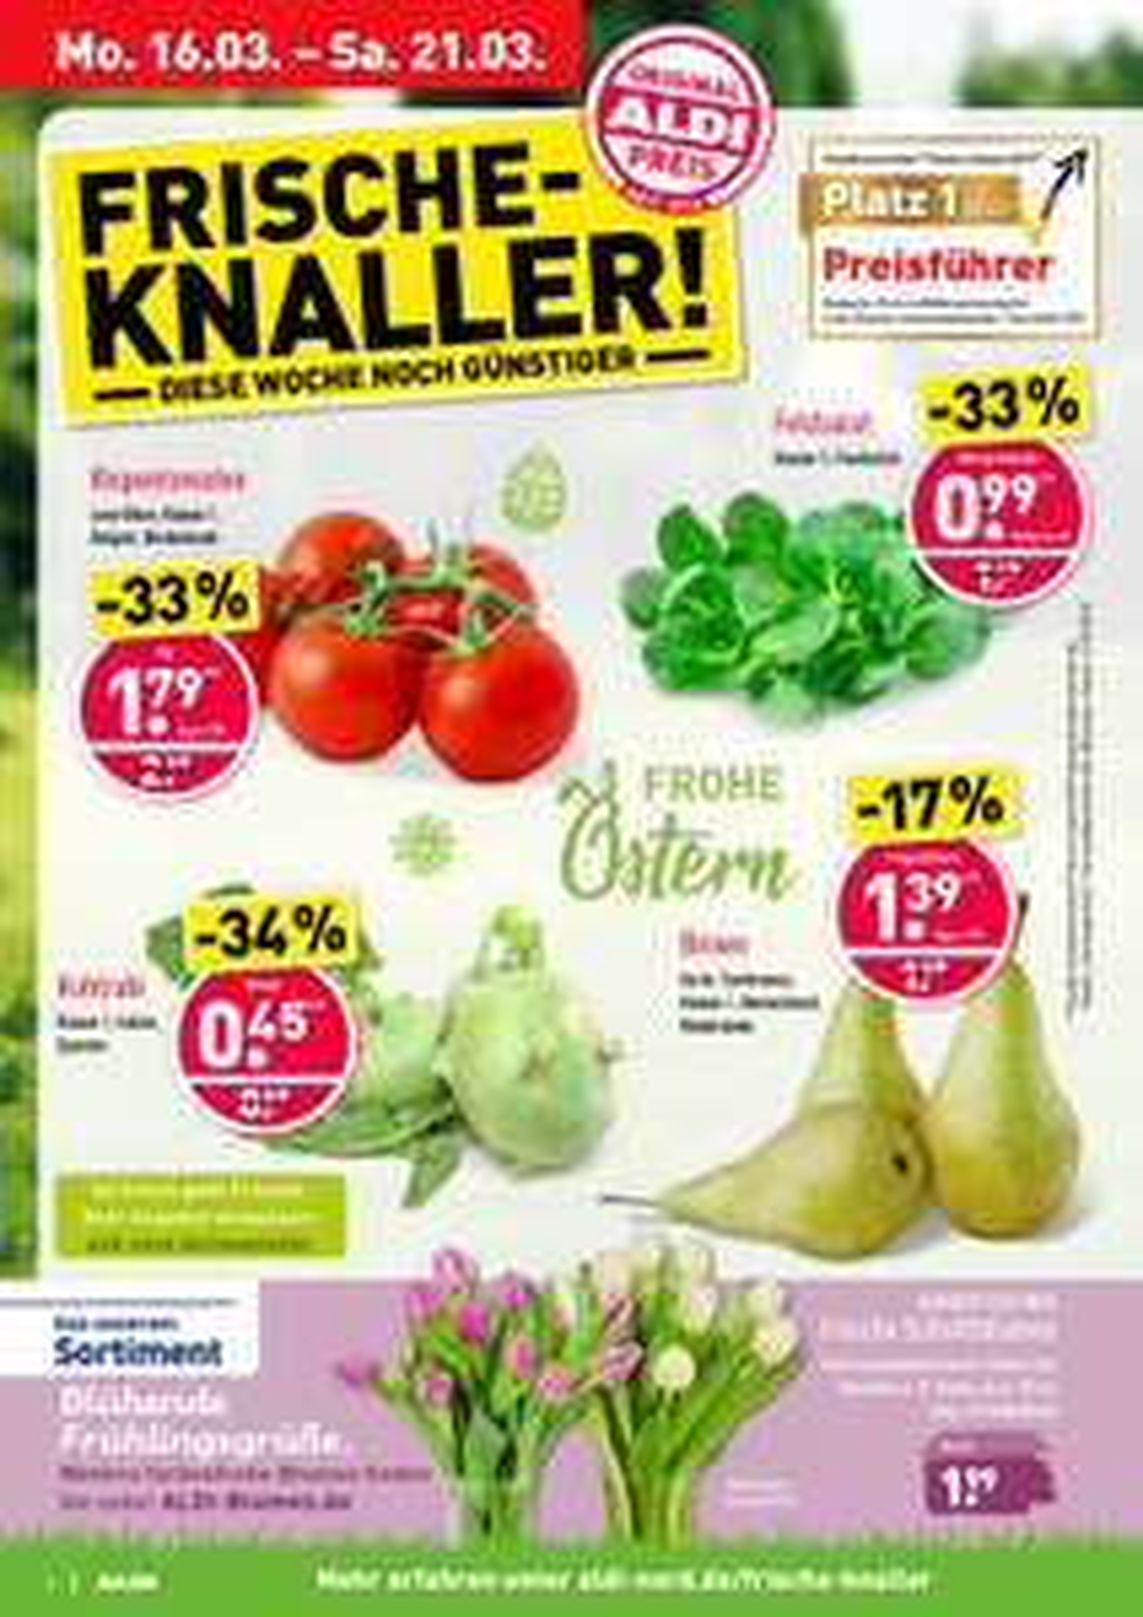 Aldi Nord Rispentomaten Kg 1,79€ Aus Belgien/Niederlande